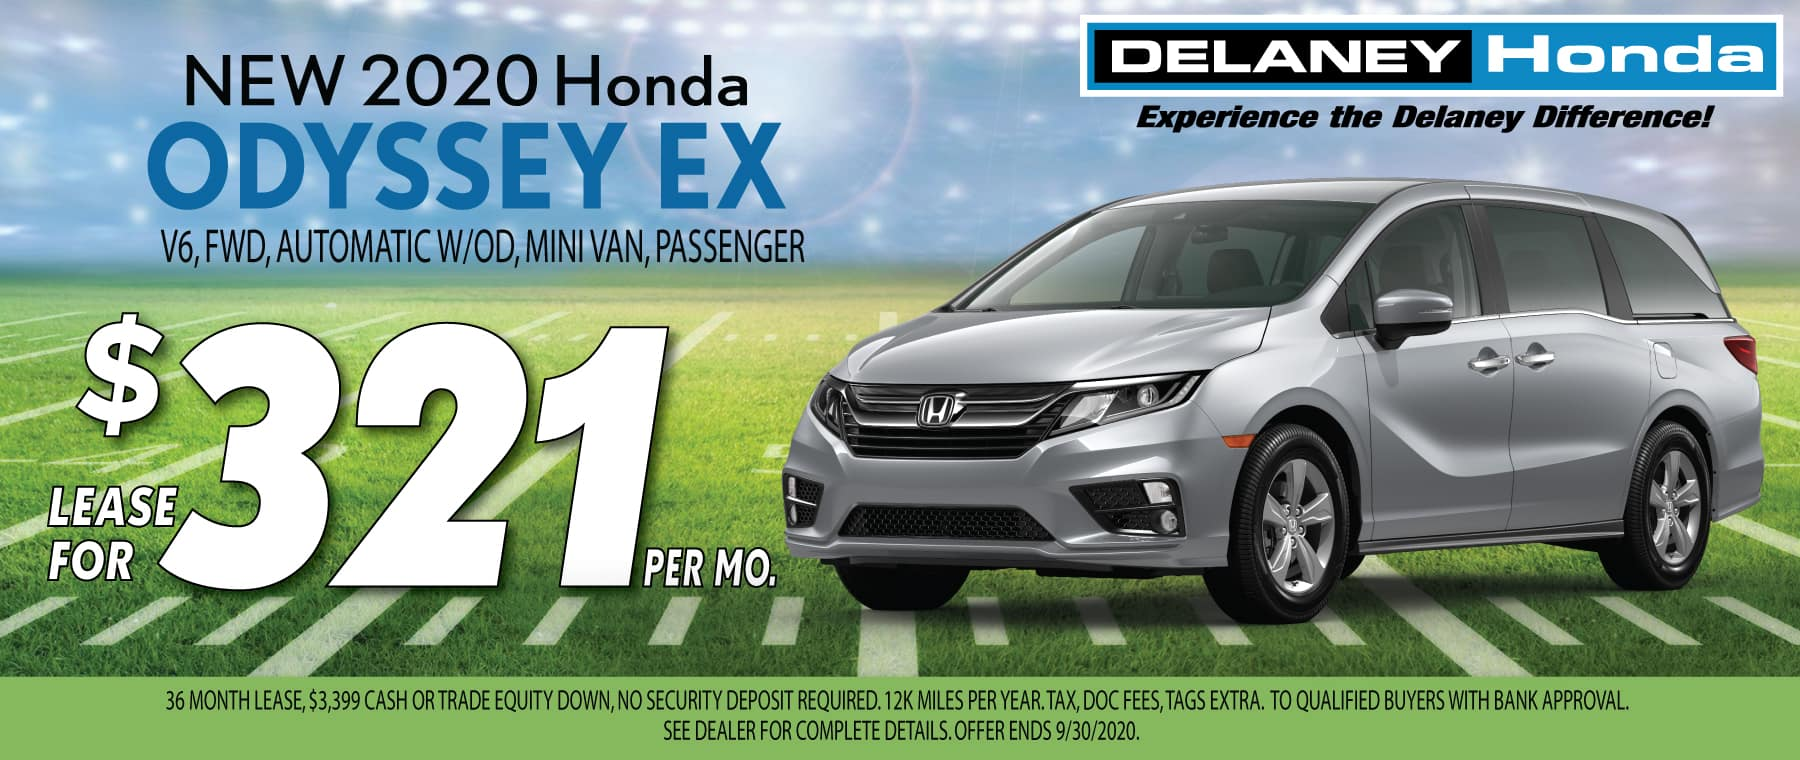 Honda Odyssey Lease Offer